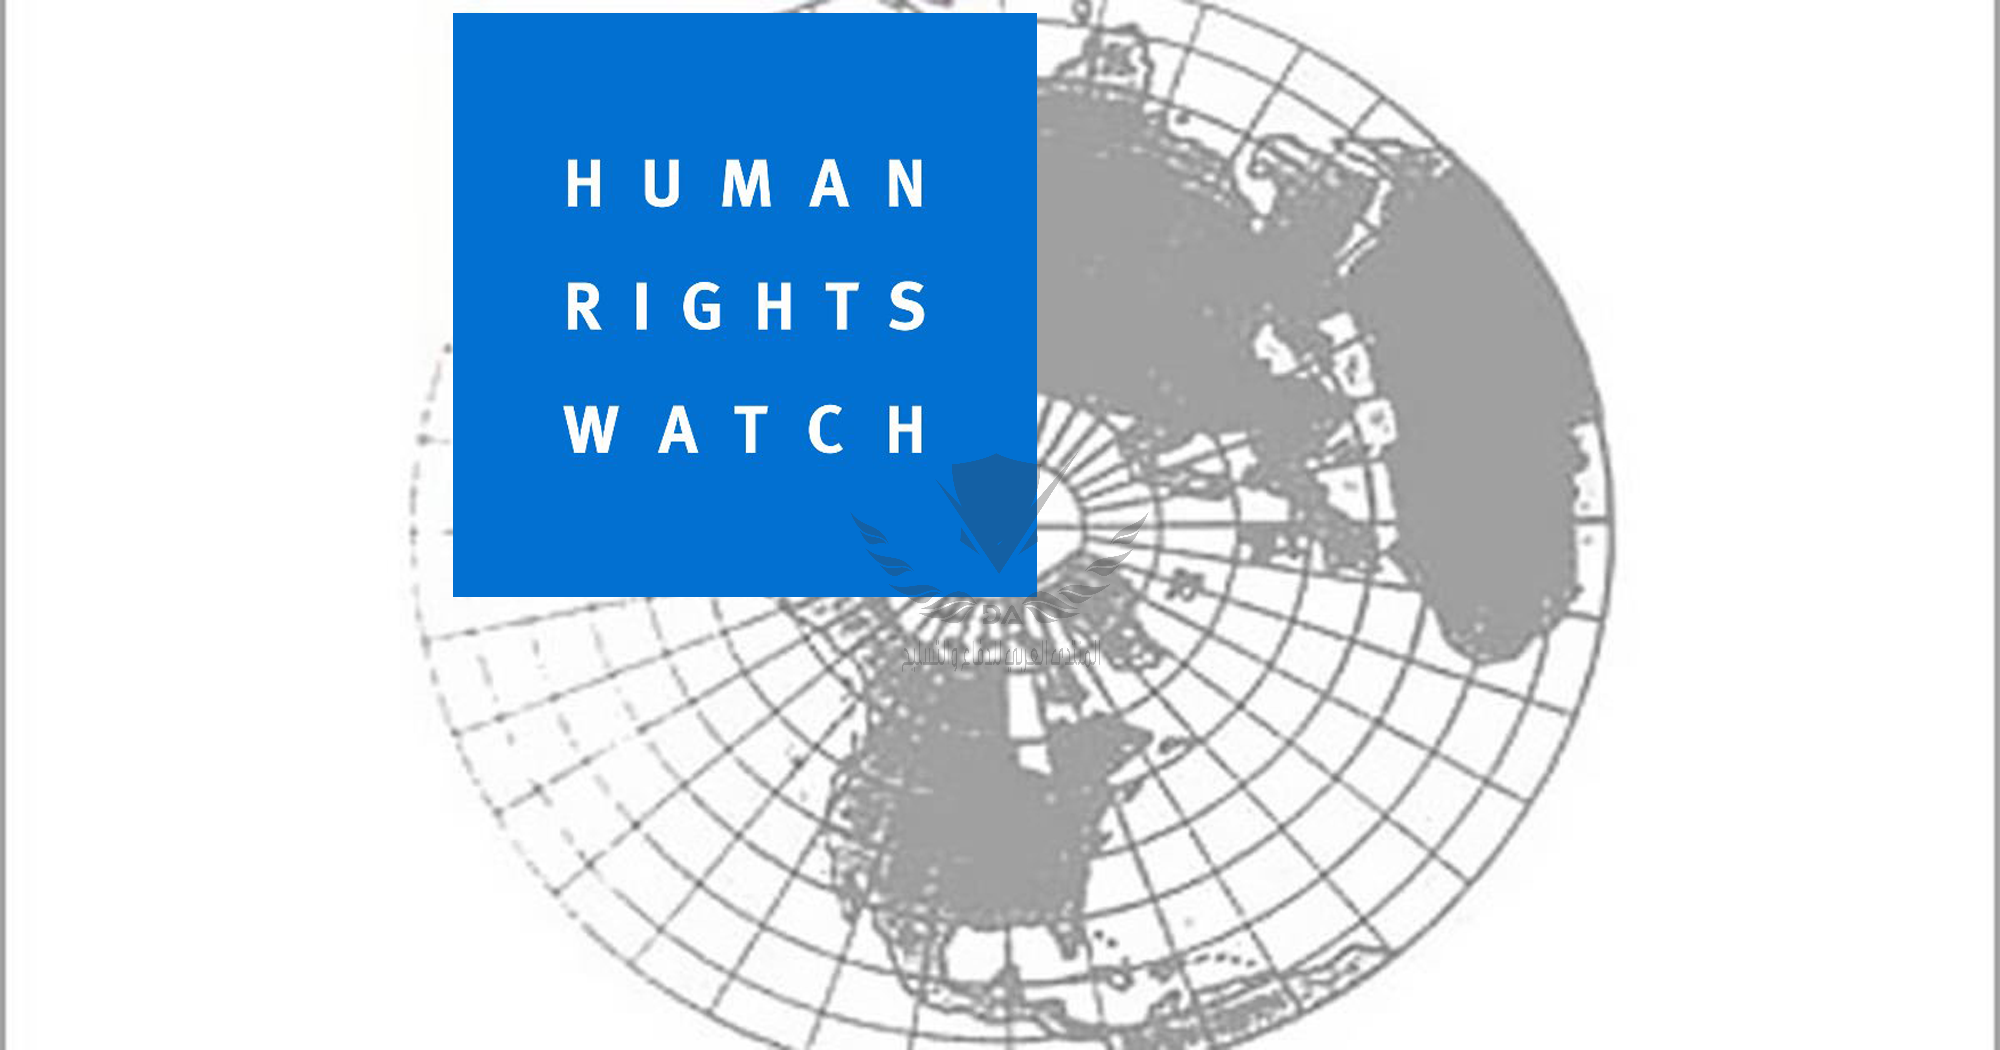 Human-Rights-Watch-Fraszka.png